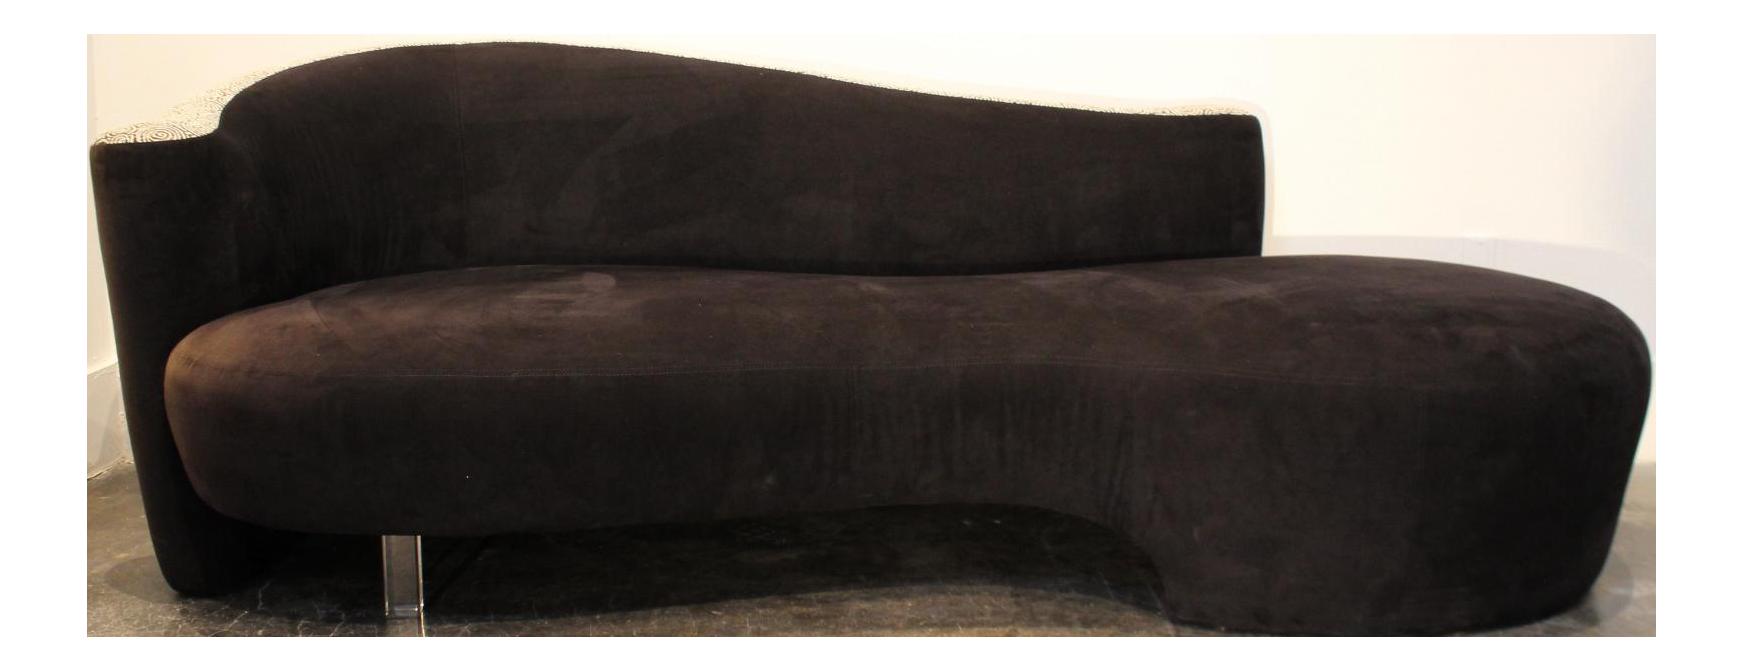 Vladimir Kagan Style Serpentine Cloud Sofa, Two Tone, Lucite Leg  Right Arm